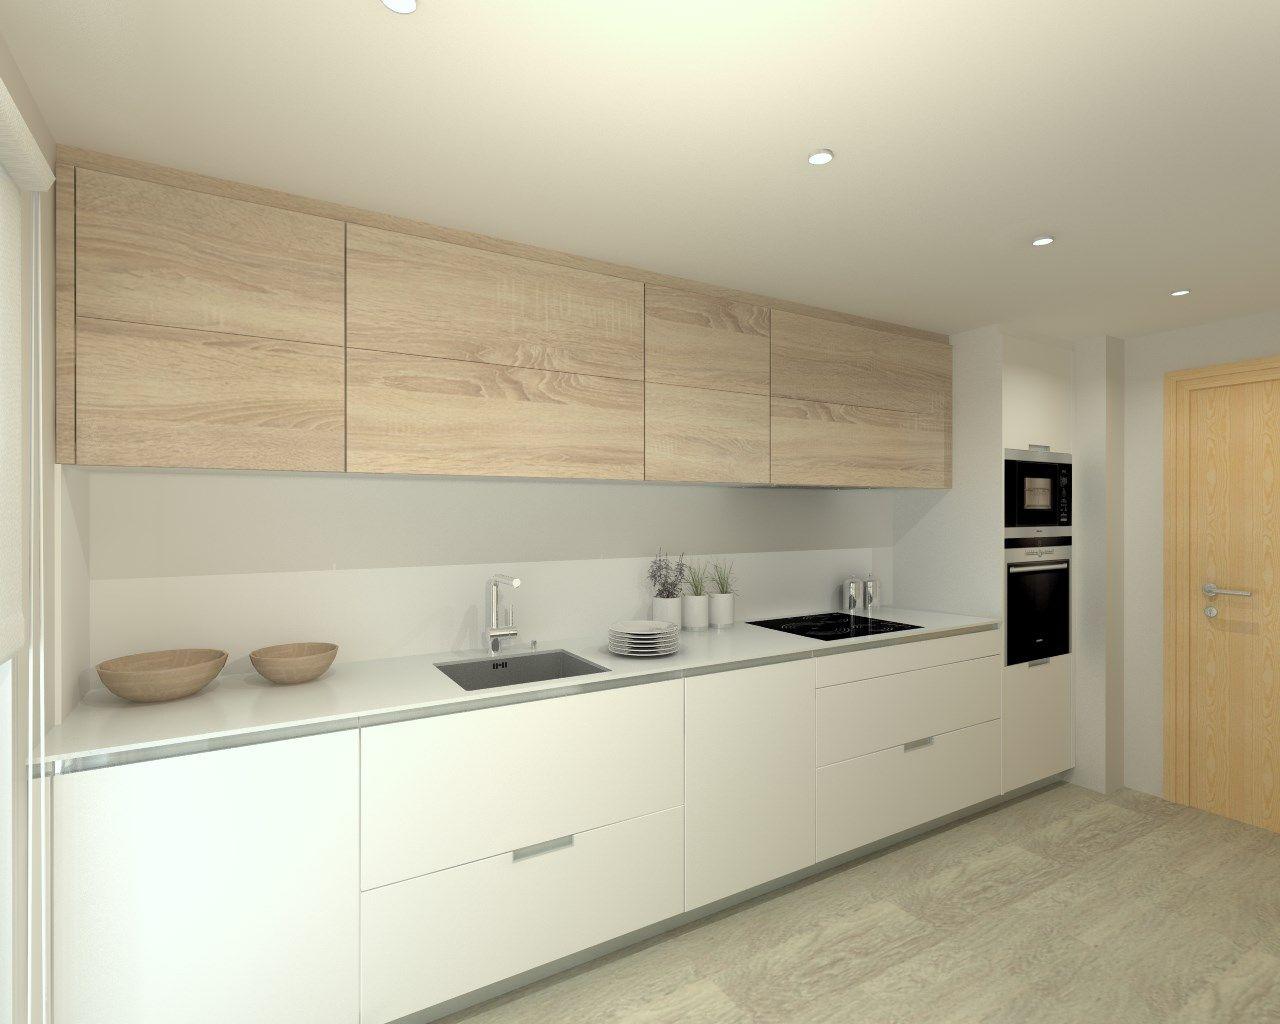 Pin by yolanda on cocinas pinterest kitchens ideas para and